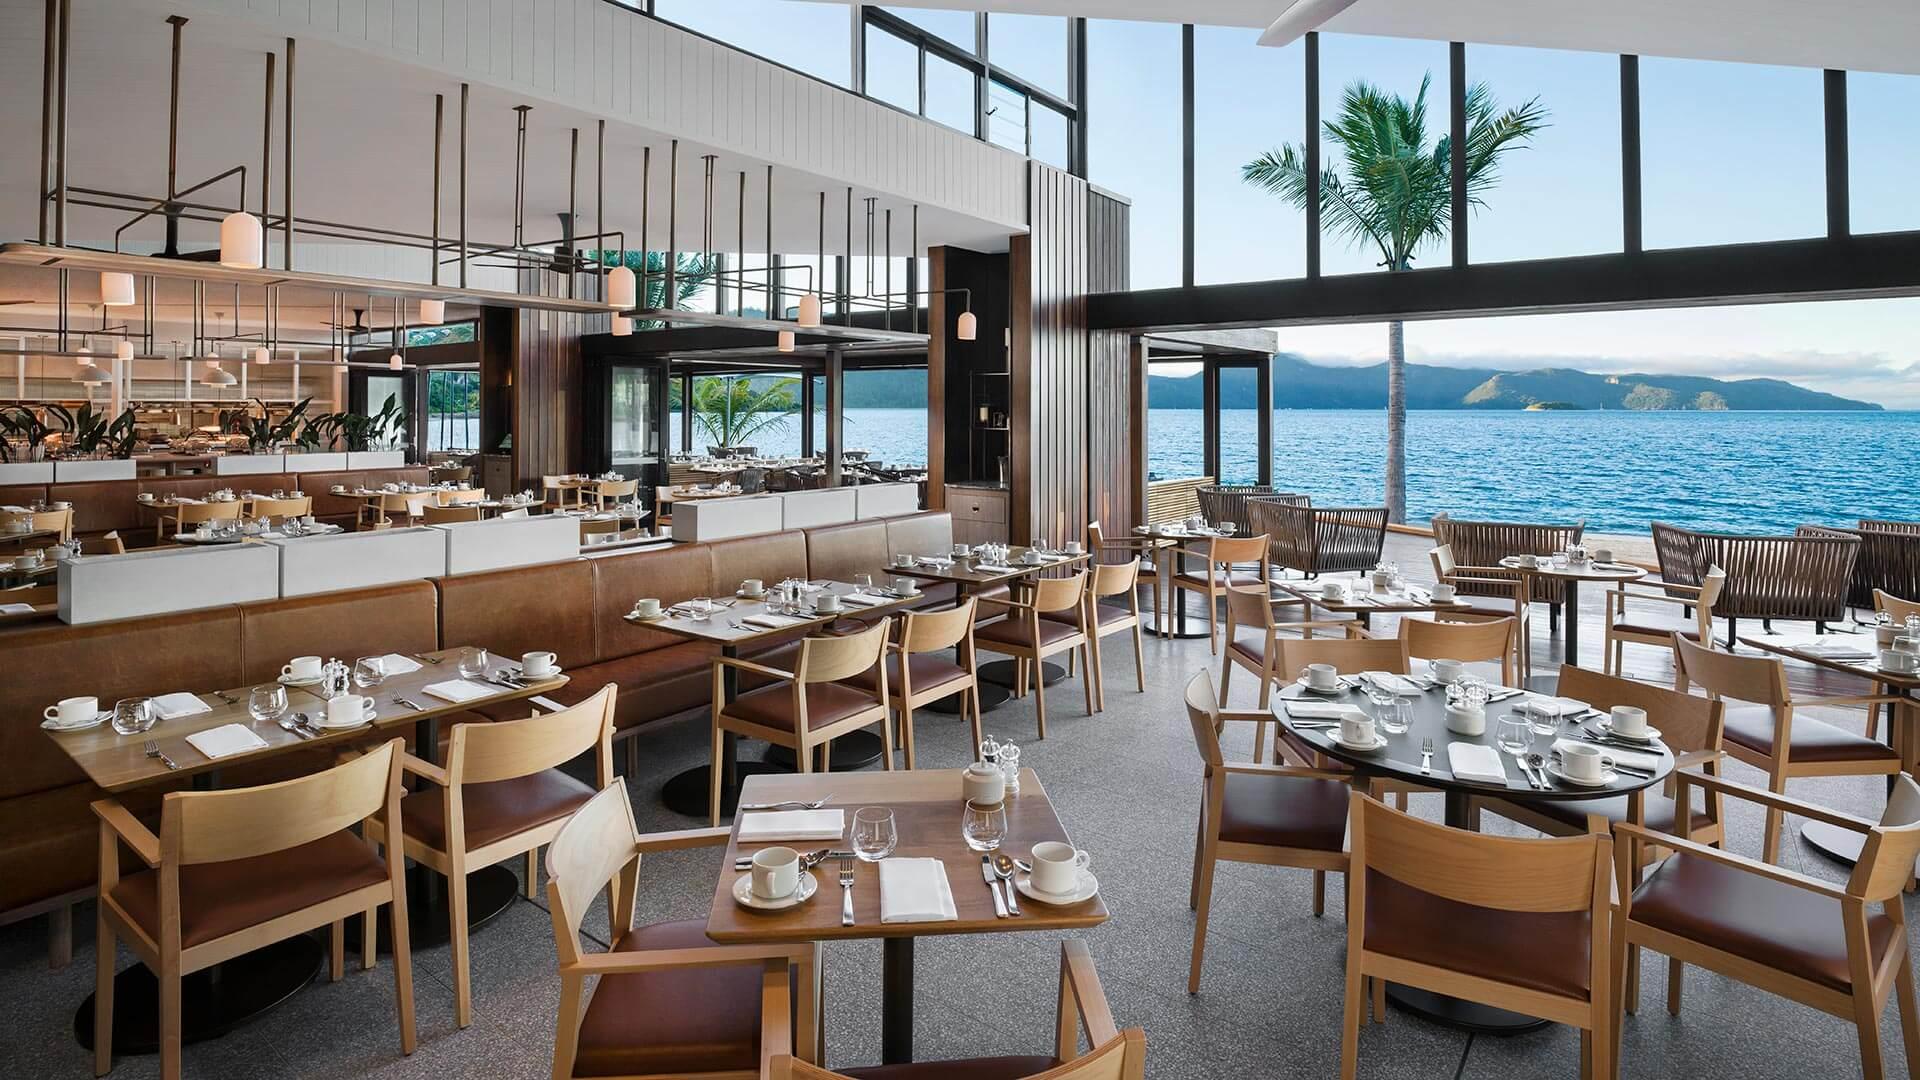 Pacific Restaurant at InterContinental Hayman Island Resort